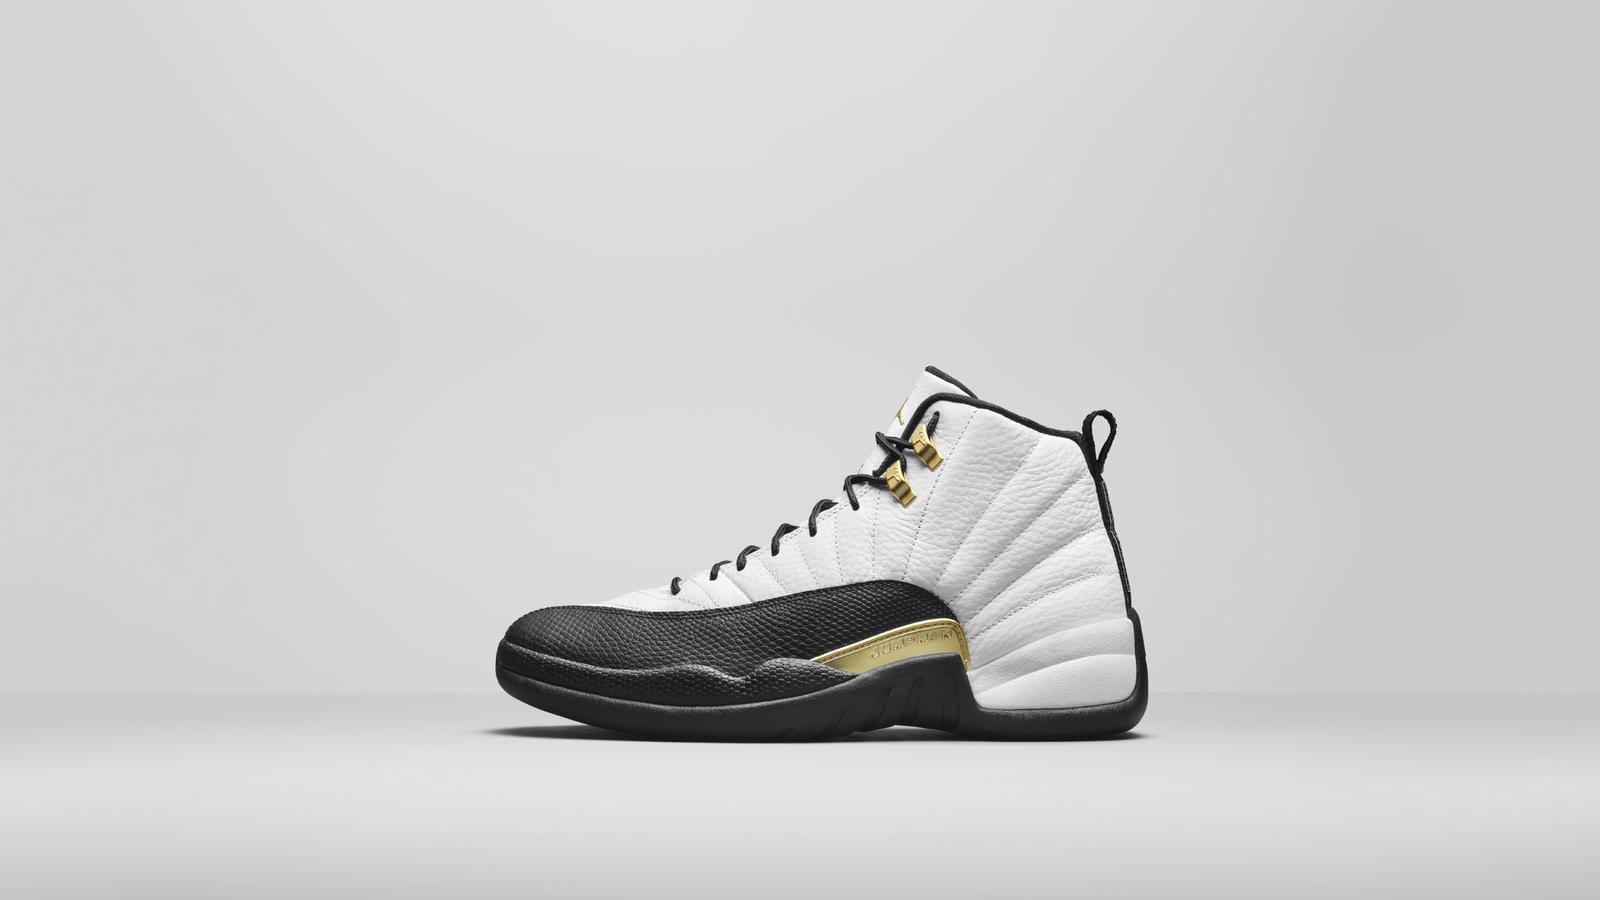 Nike News Jordan Brand Ho21 Retro Preview Aj Xii Retro Ct8013 170 A1 Lateral V02 Lr